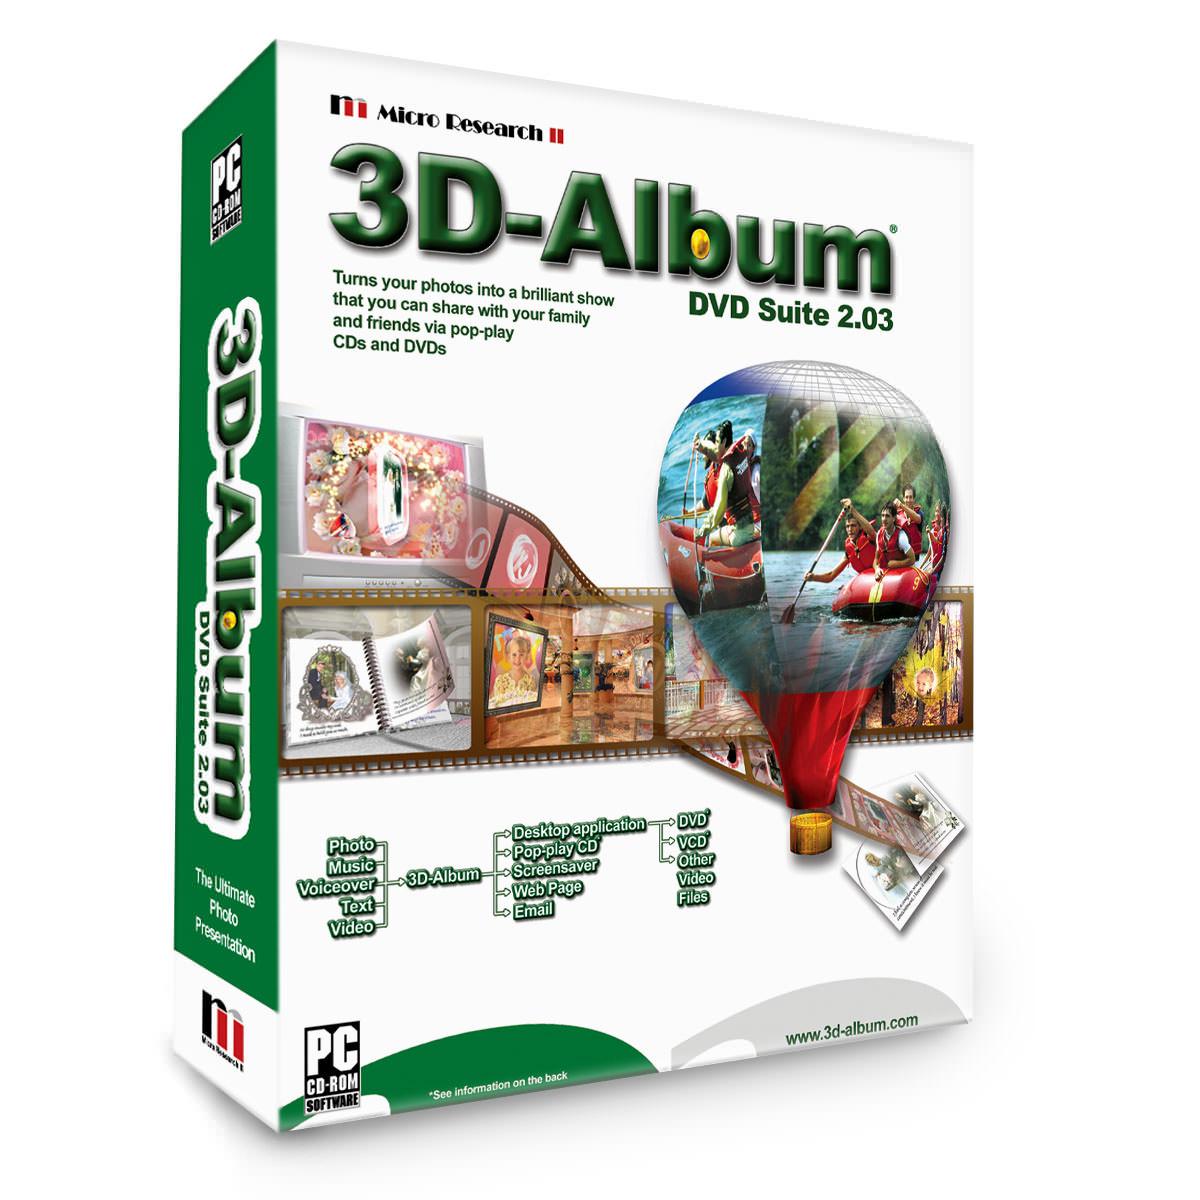 3D-Album file extensions